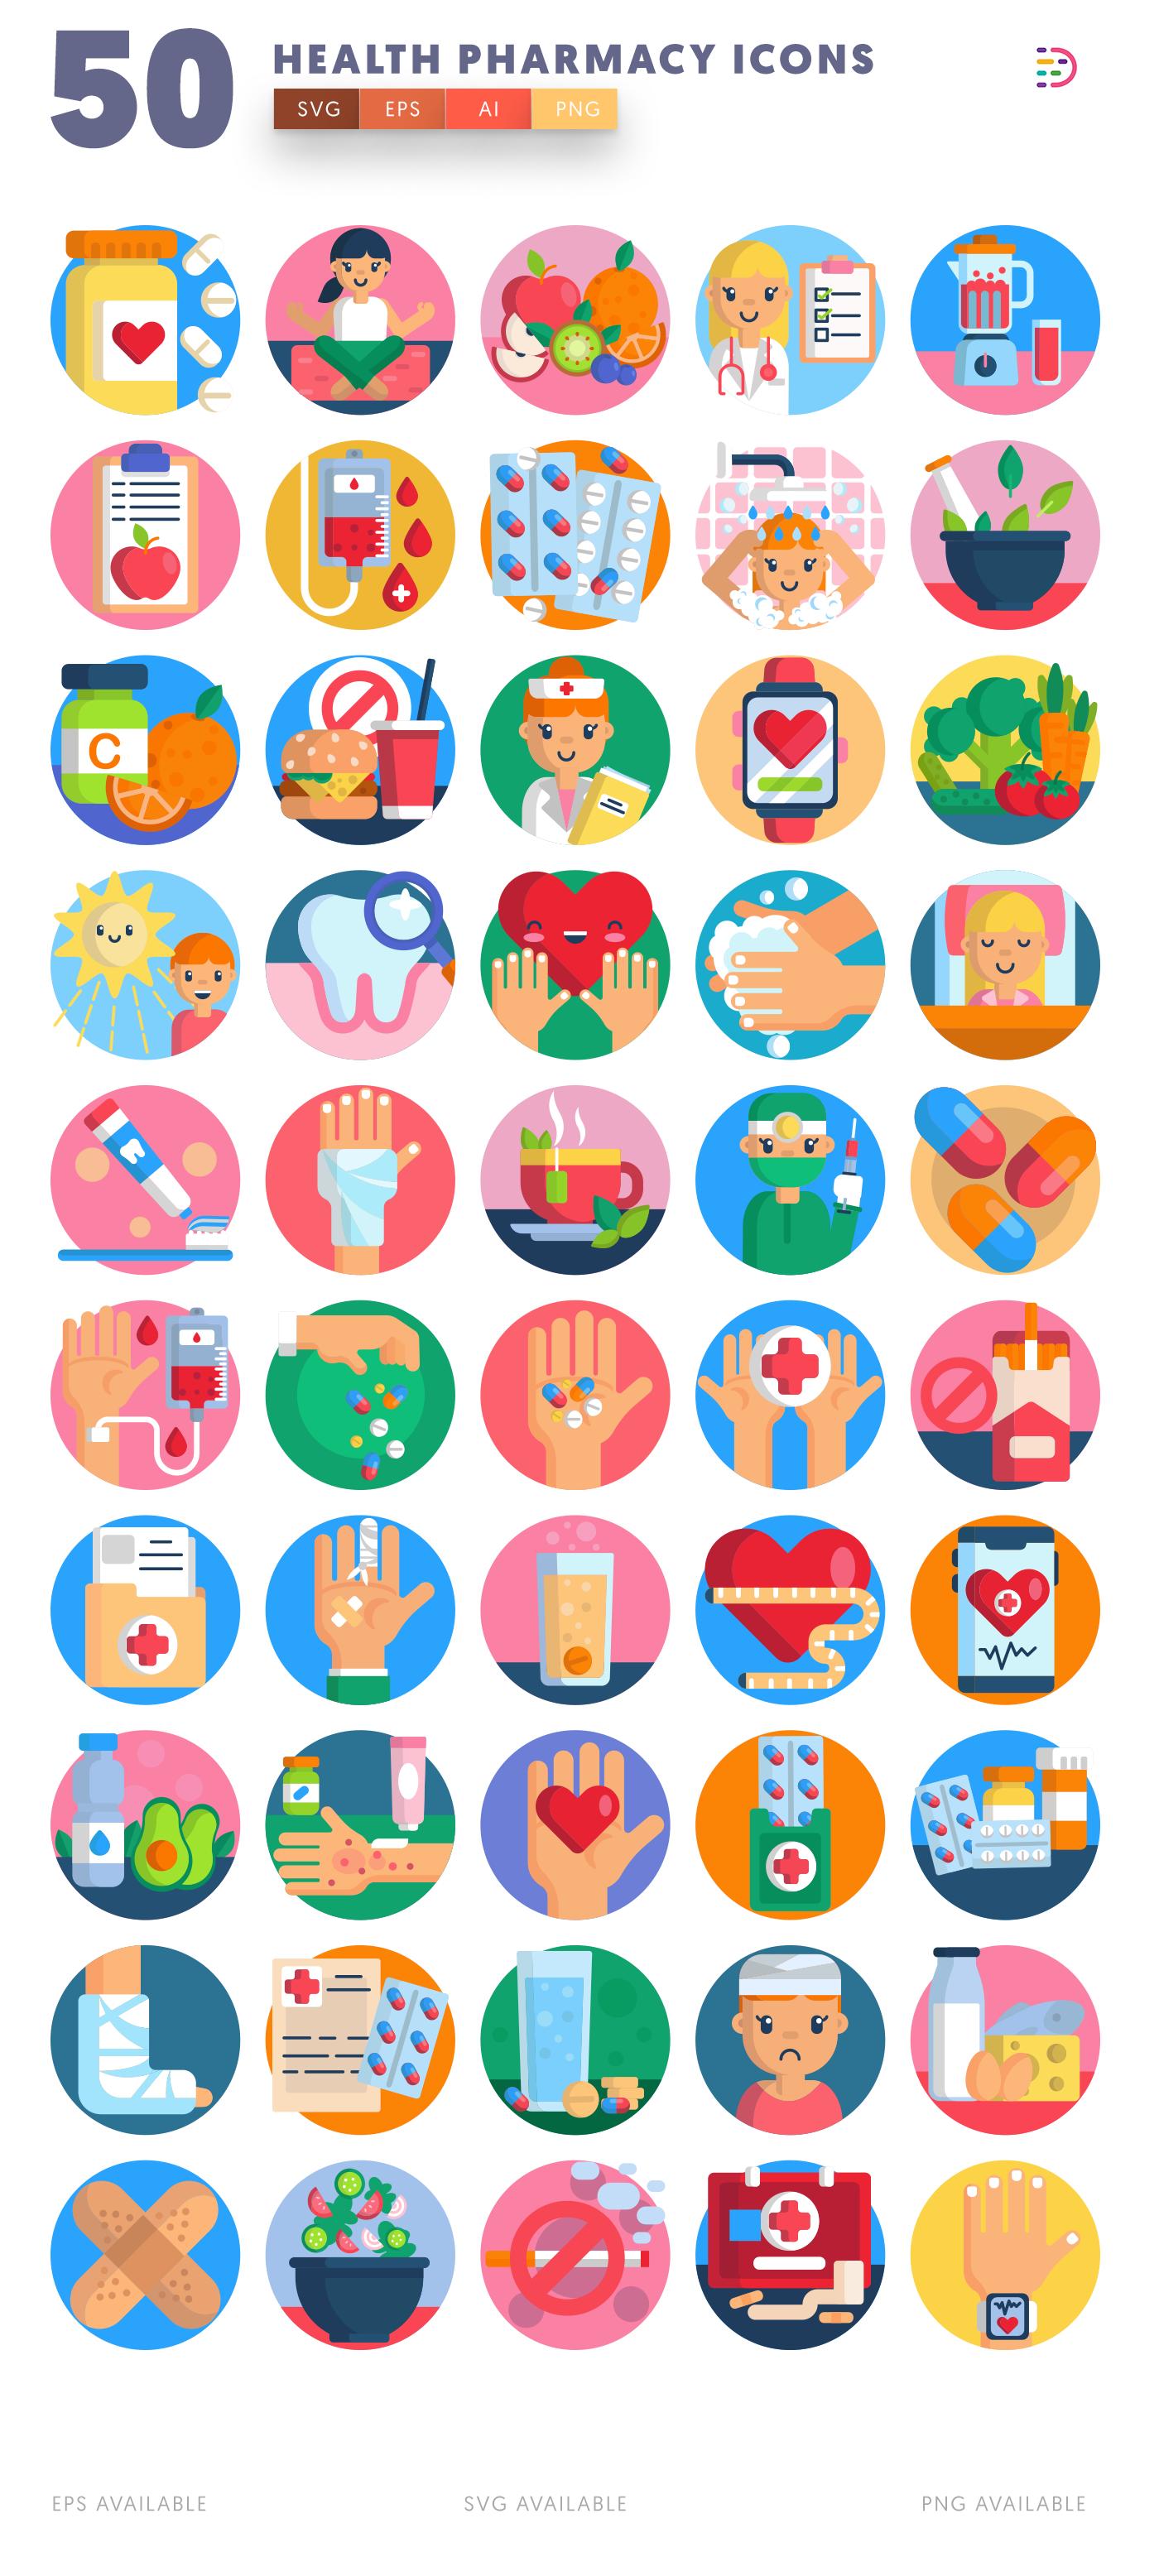 Design ready 50 Health Pharmacy Icons